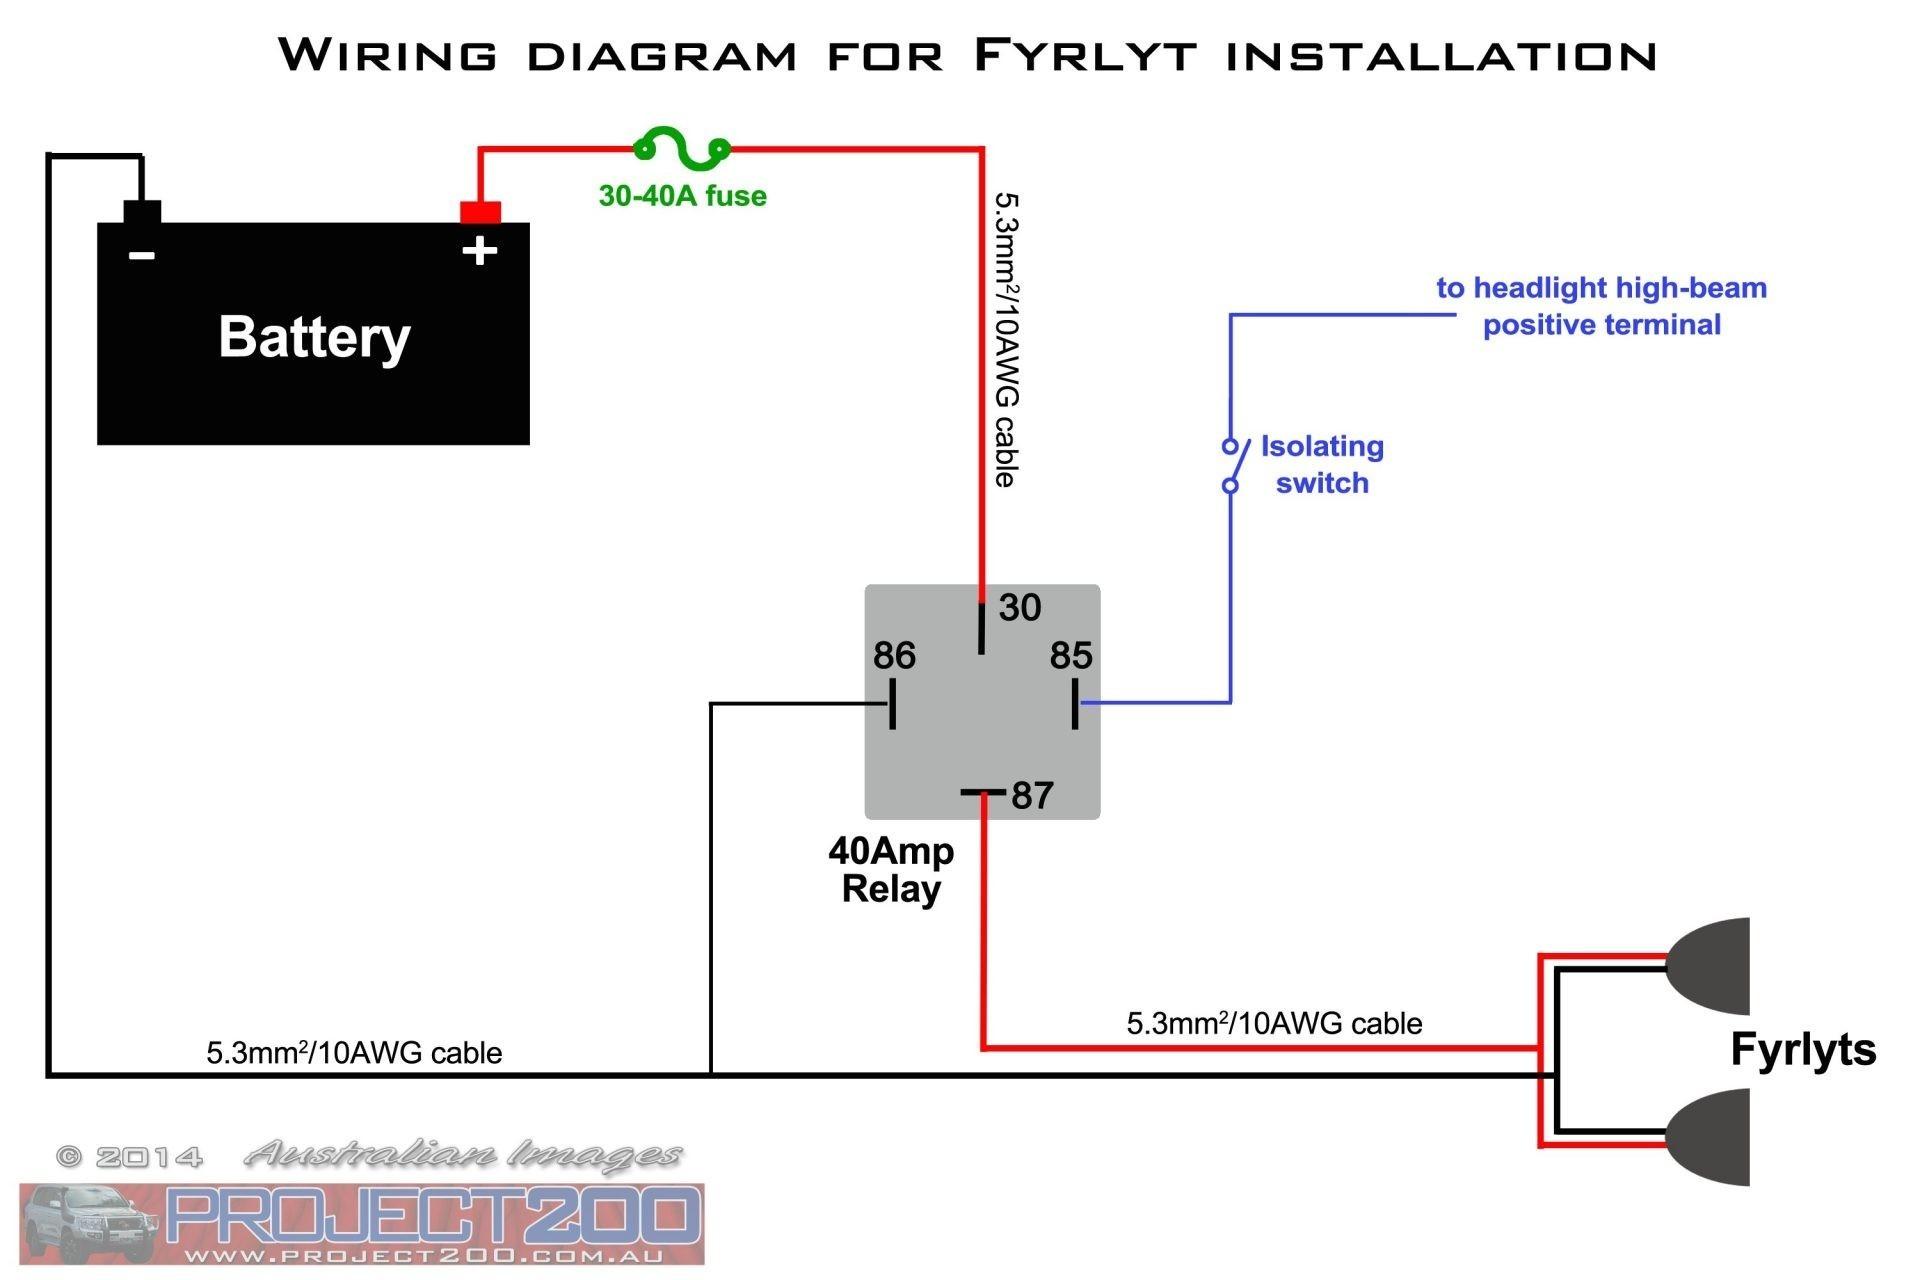 Led Light Bar Wiring Diagram Rzr Fresh Rzr Headlight Wiring Diagram Copy Light Bar Wire Ledng To High Beam